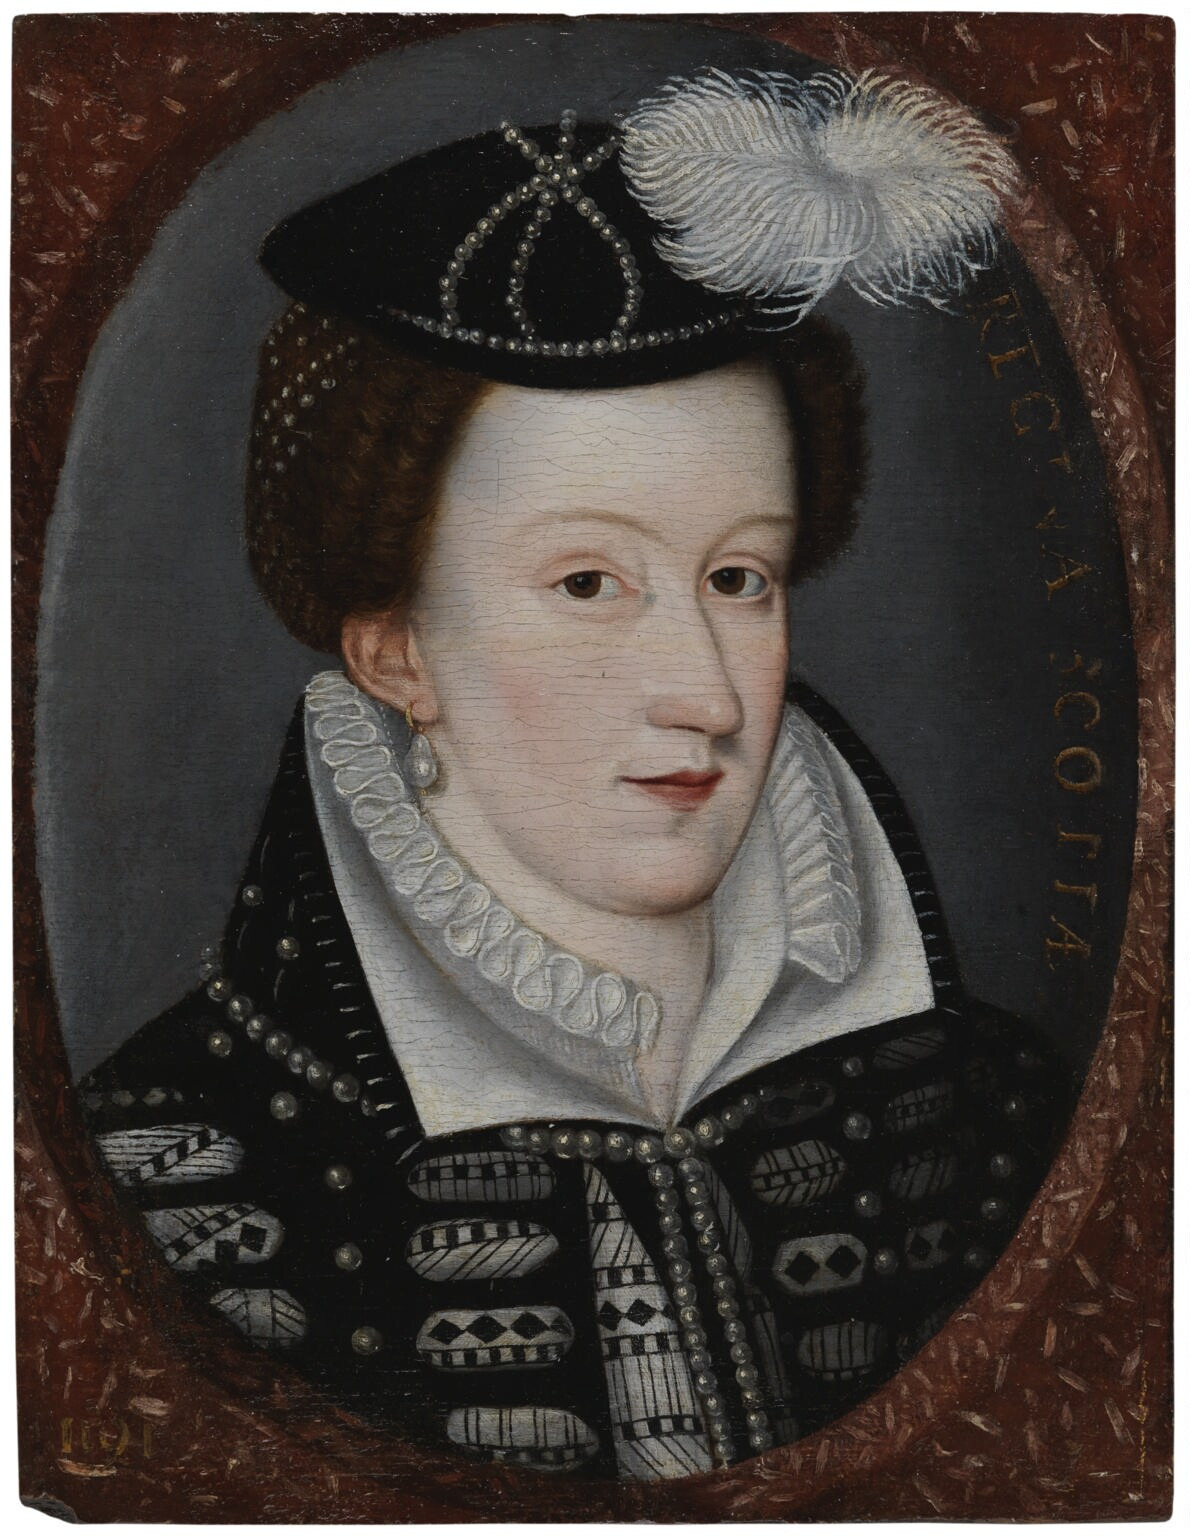 Archivo:Mary Queen of Scots portrait.jpg